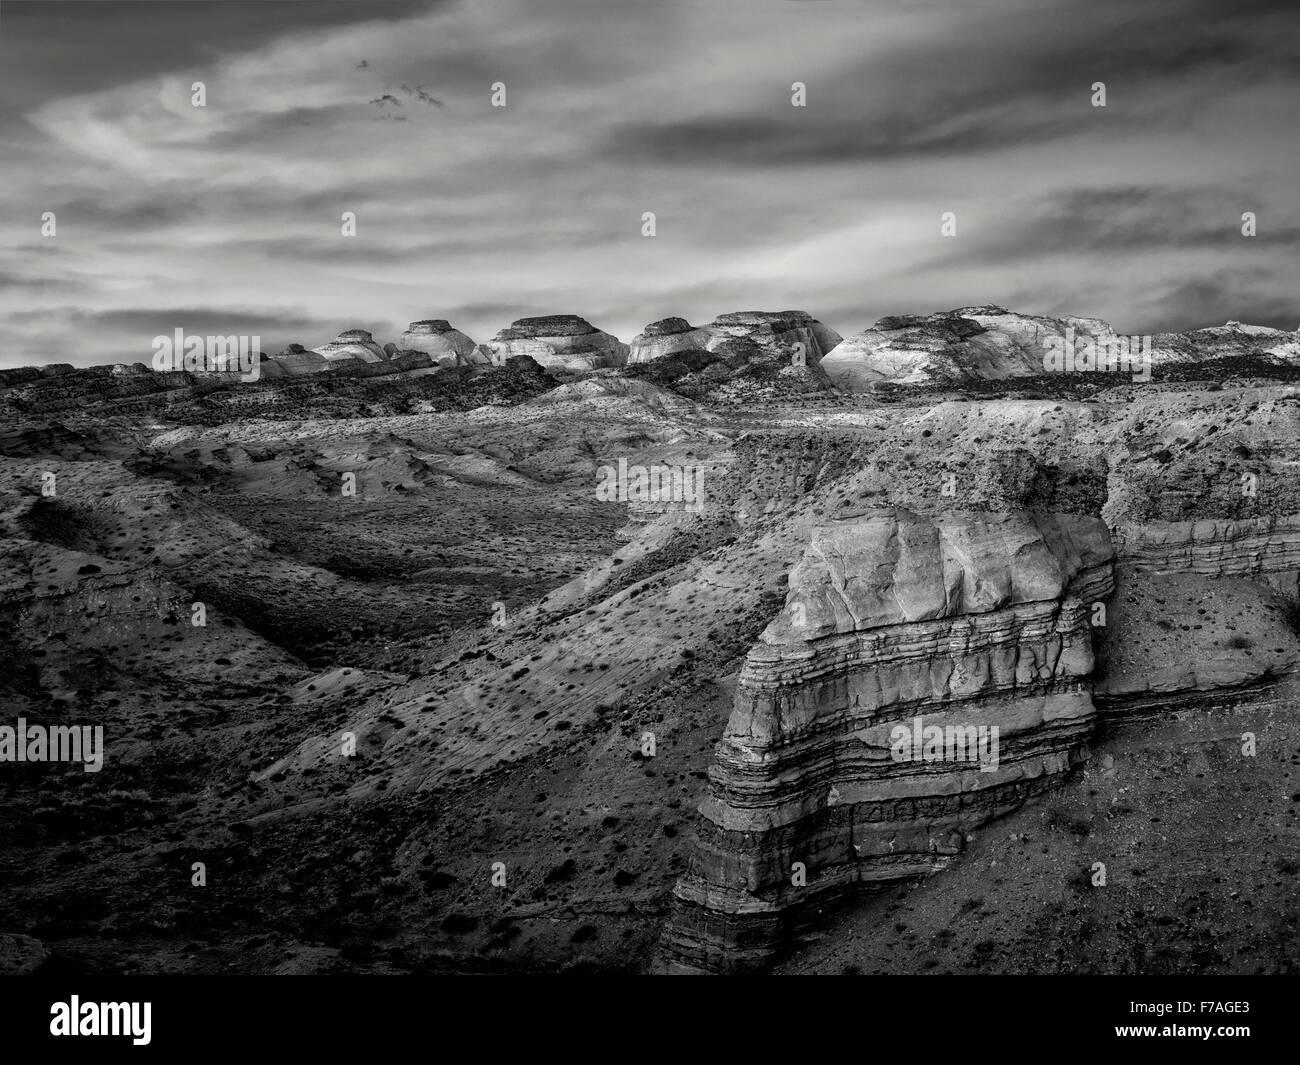 Sonnenaufgang auf der Hartnet Süd Wüste Waterpocket Fold. Capitol Reef National Park, Utah Stockbild